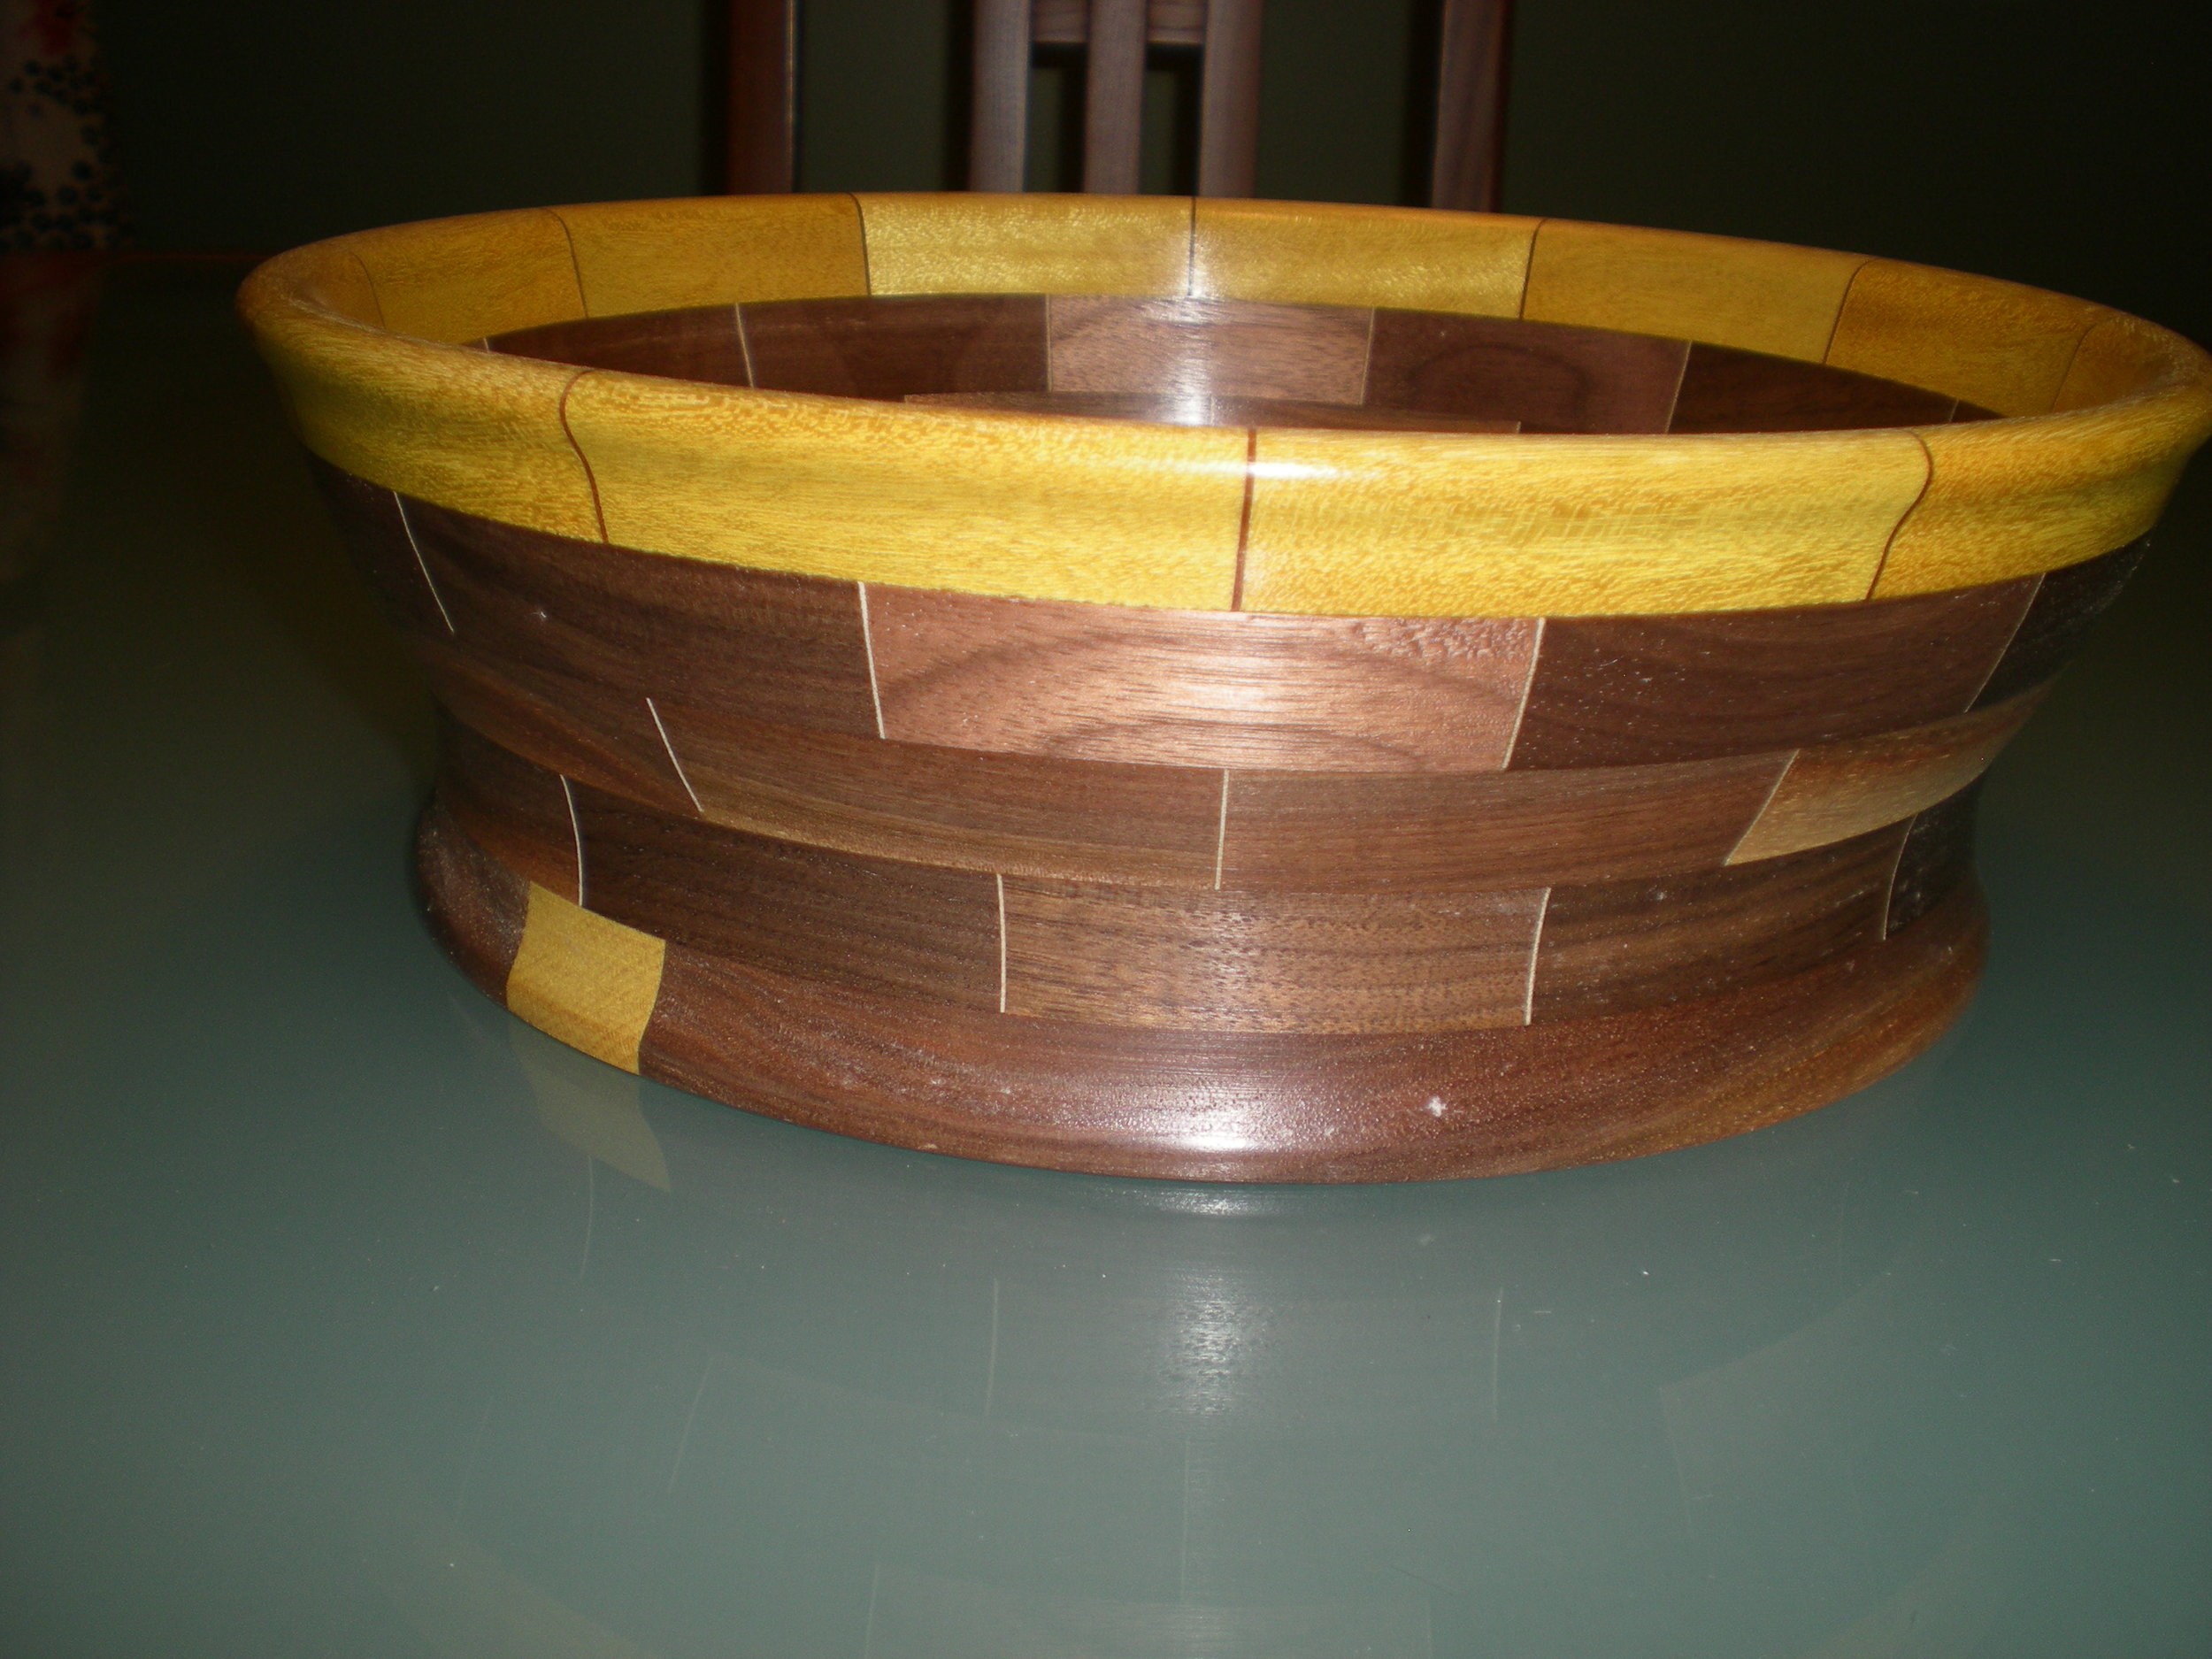 RJC Wood Creations - Bowls (37).JPG